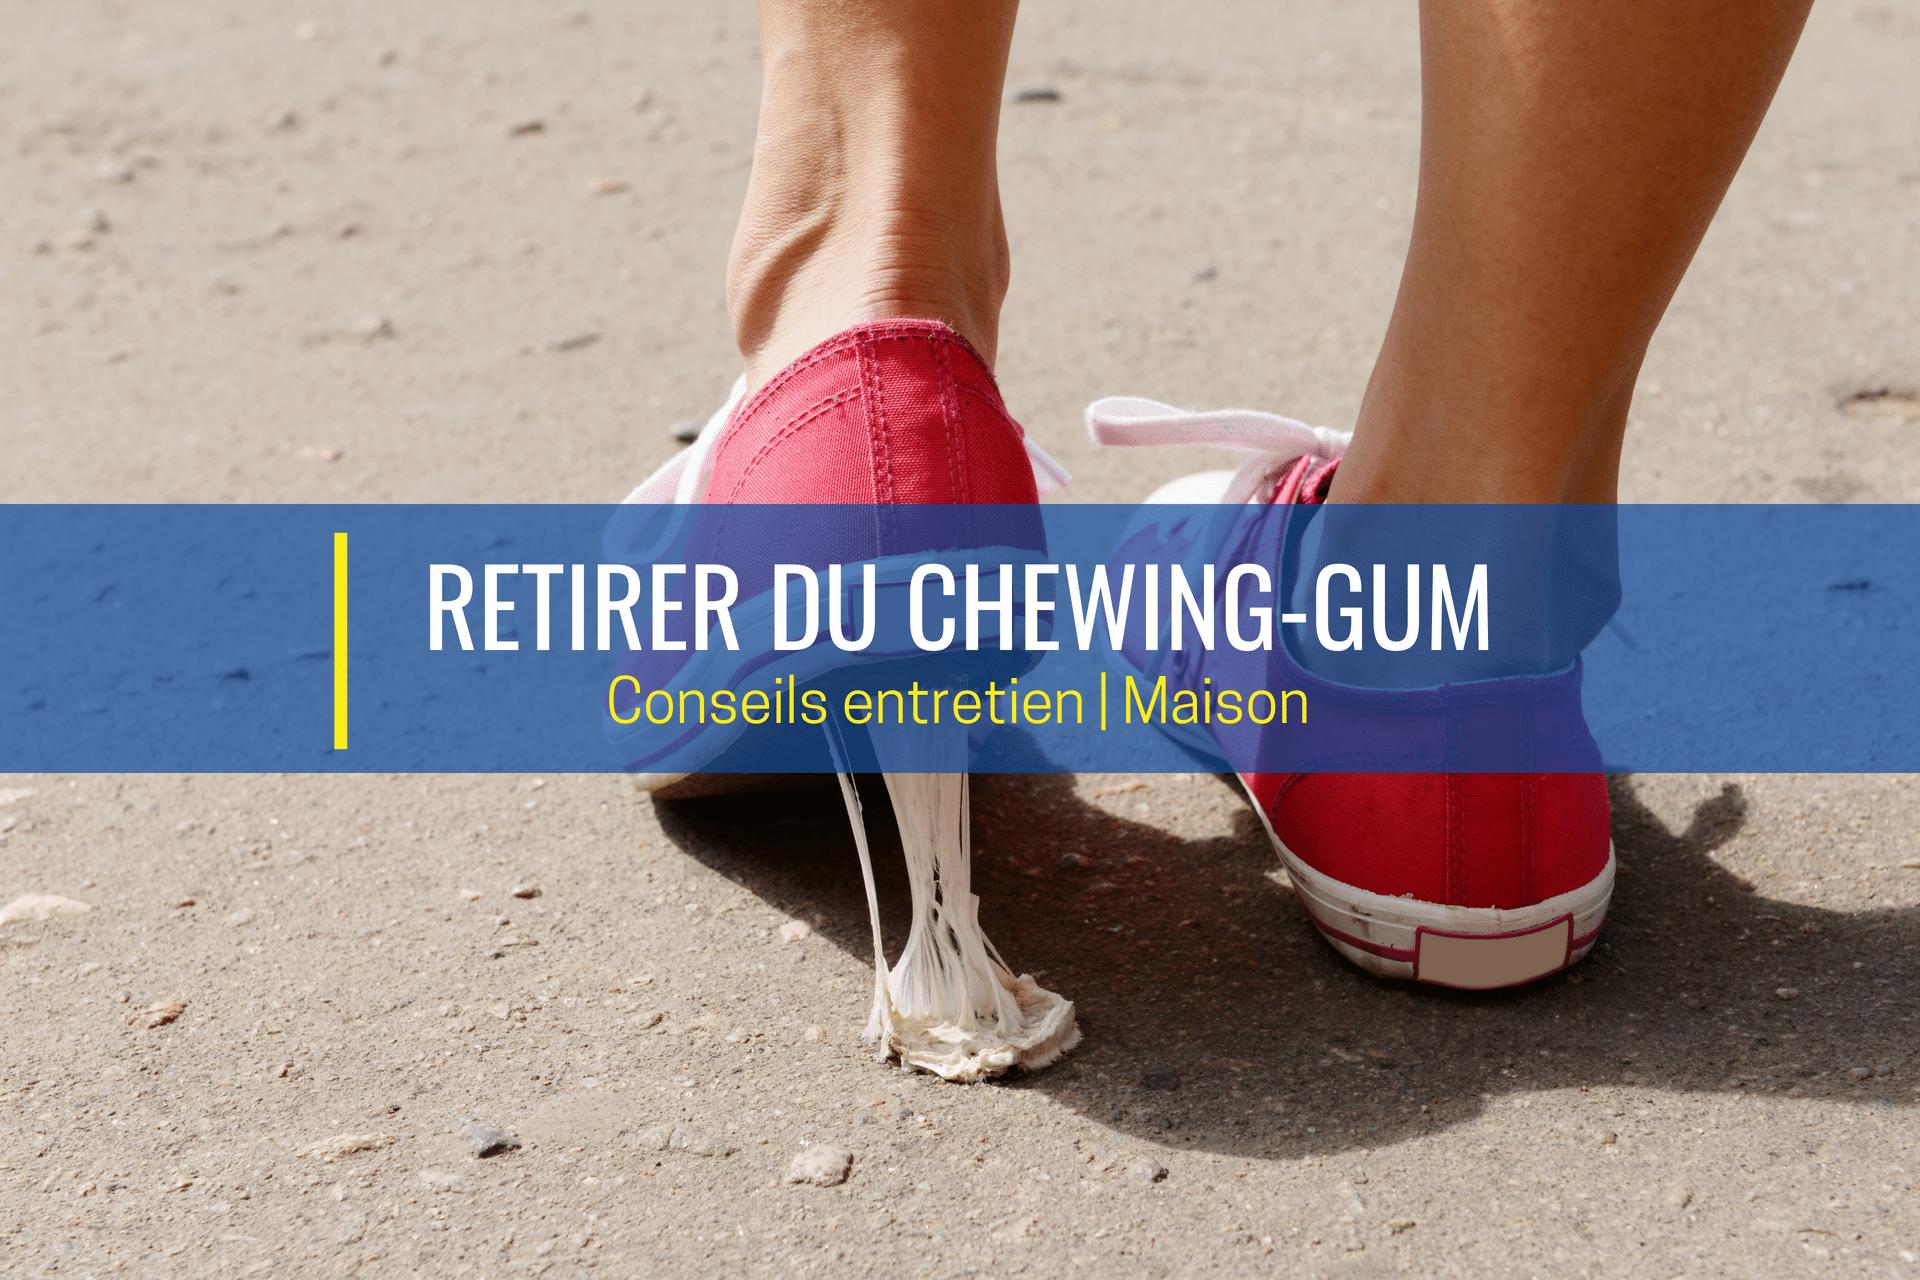 retirer du chewing gum